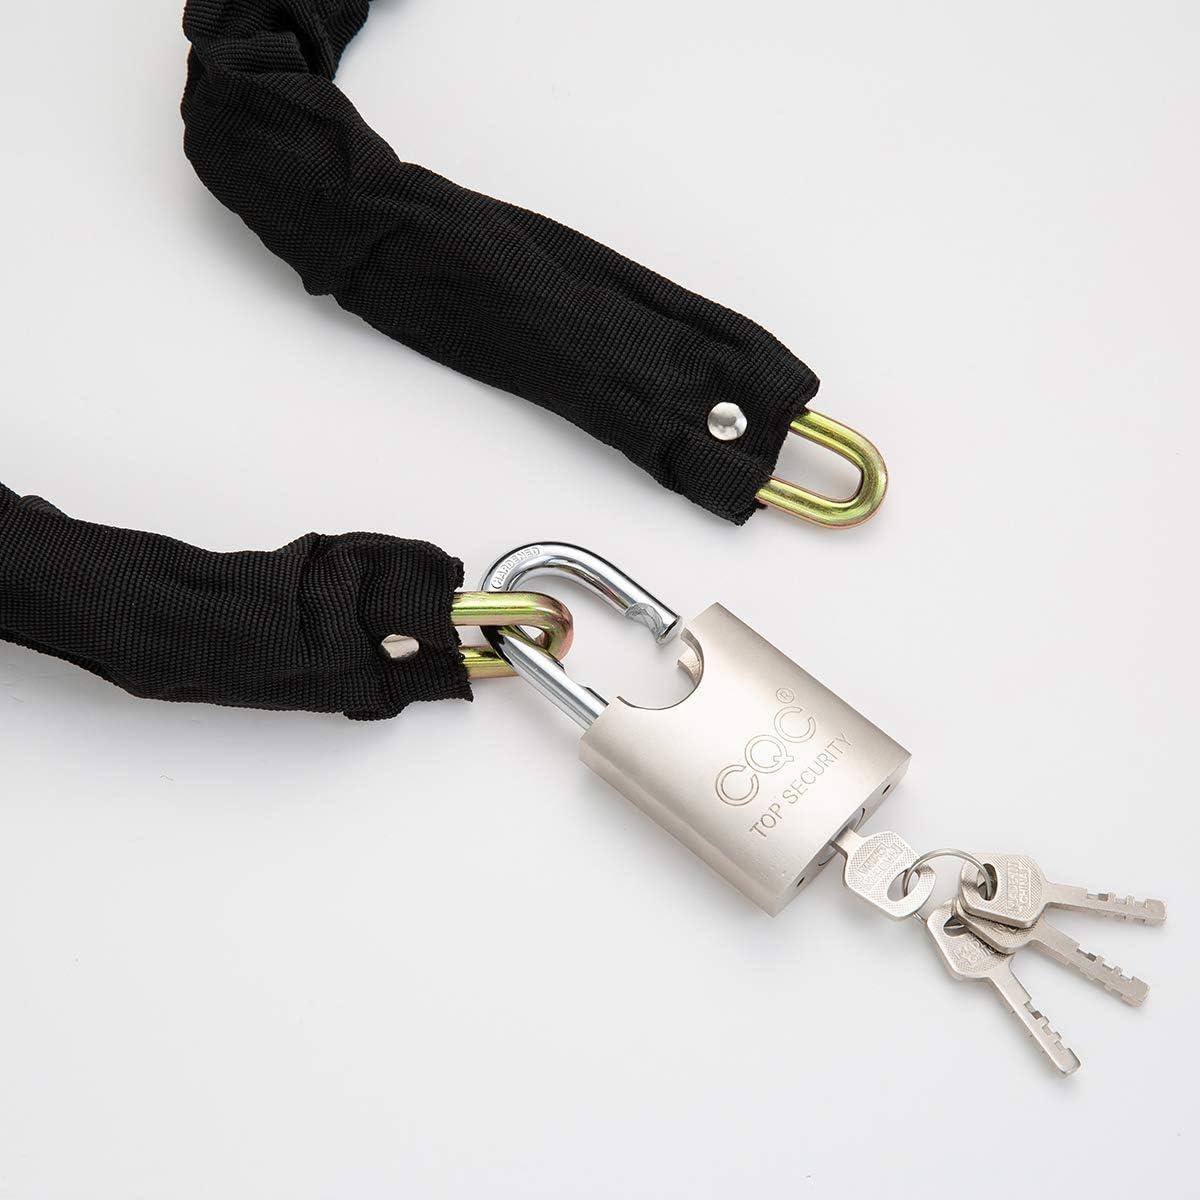 Heavy Duty Motorbike Cycle Chain Lock PadLock for Motorcycle Bike Bicycle Door Gate Fence